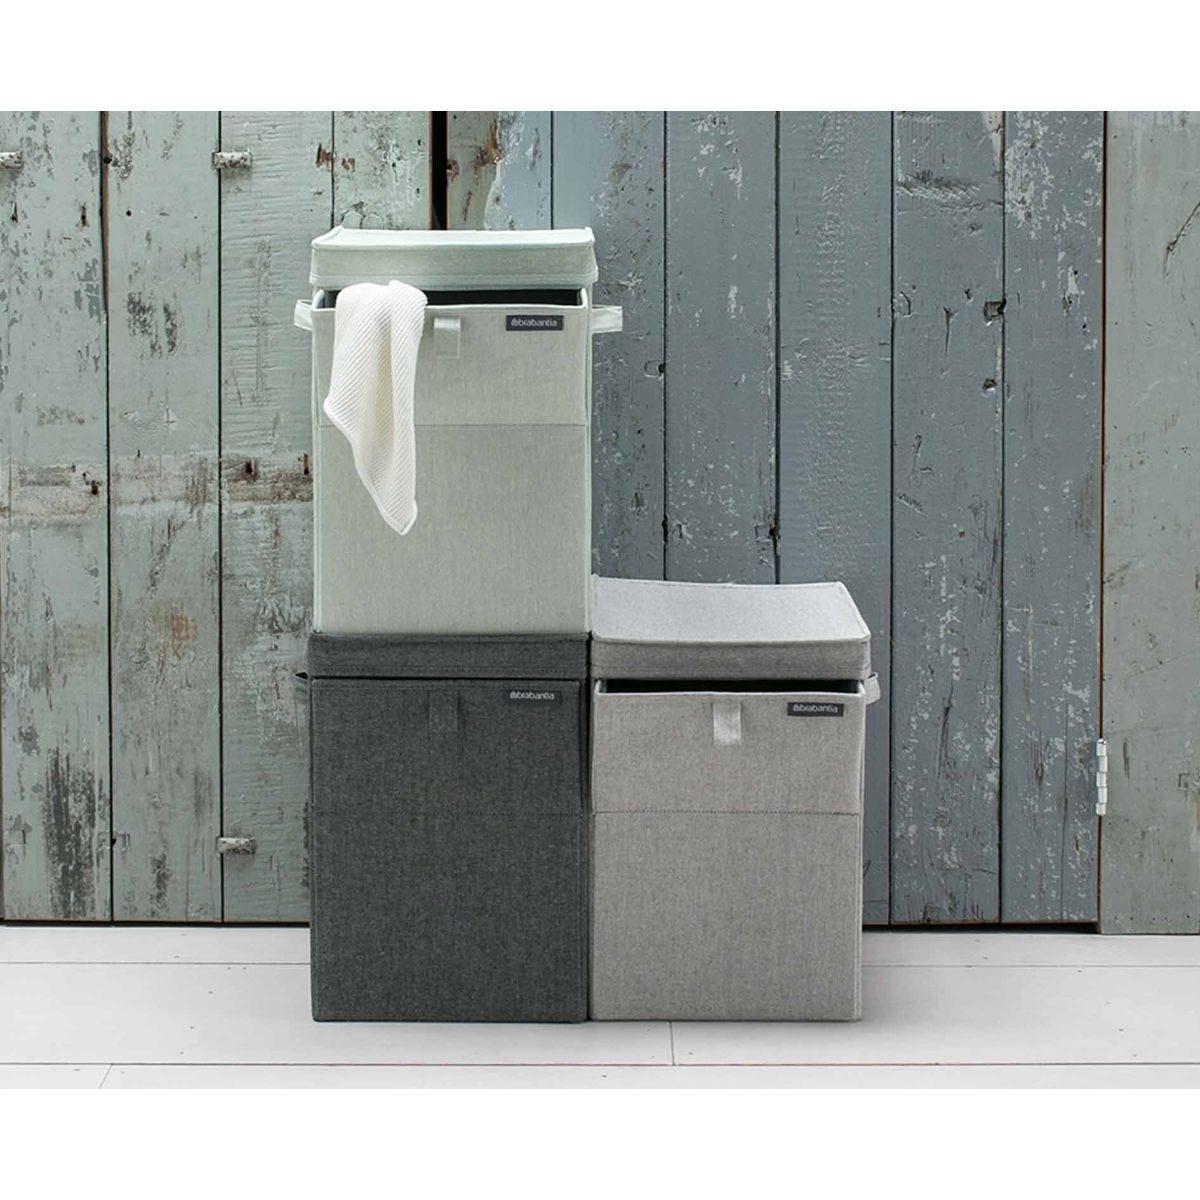 Brabantia Rectangular Laundry Box 35 Litre, Charcoal